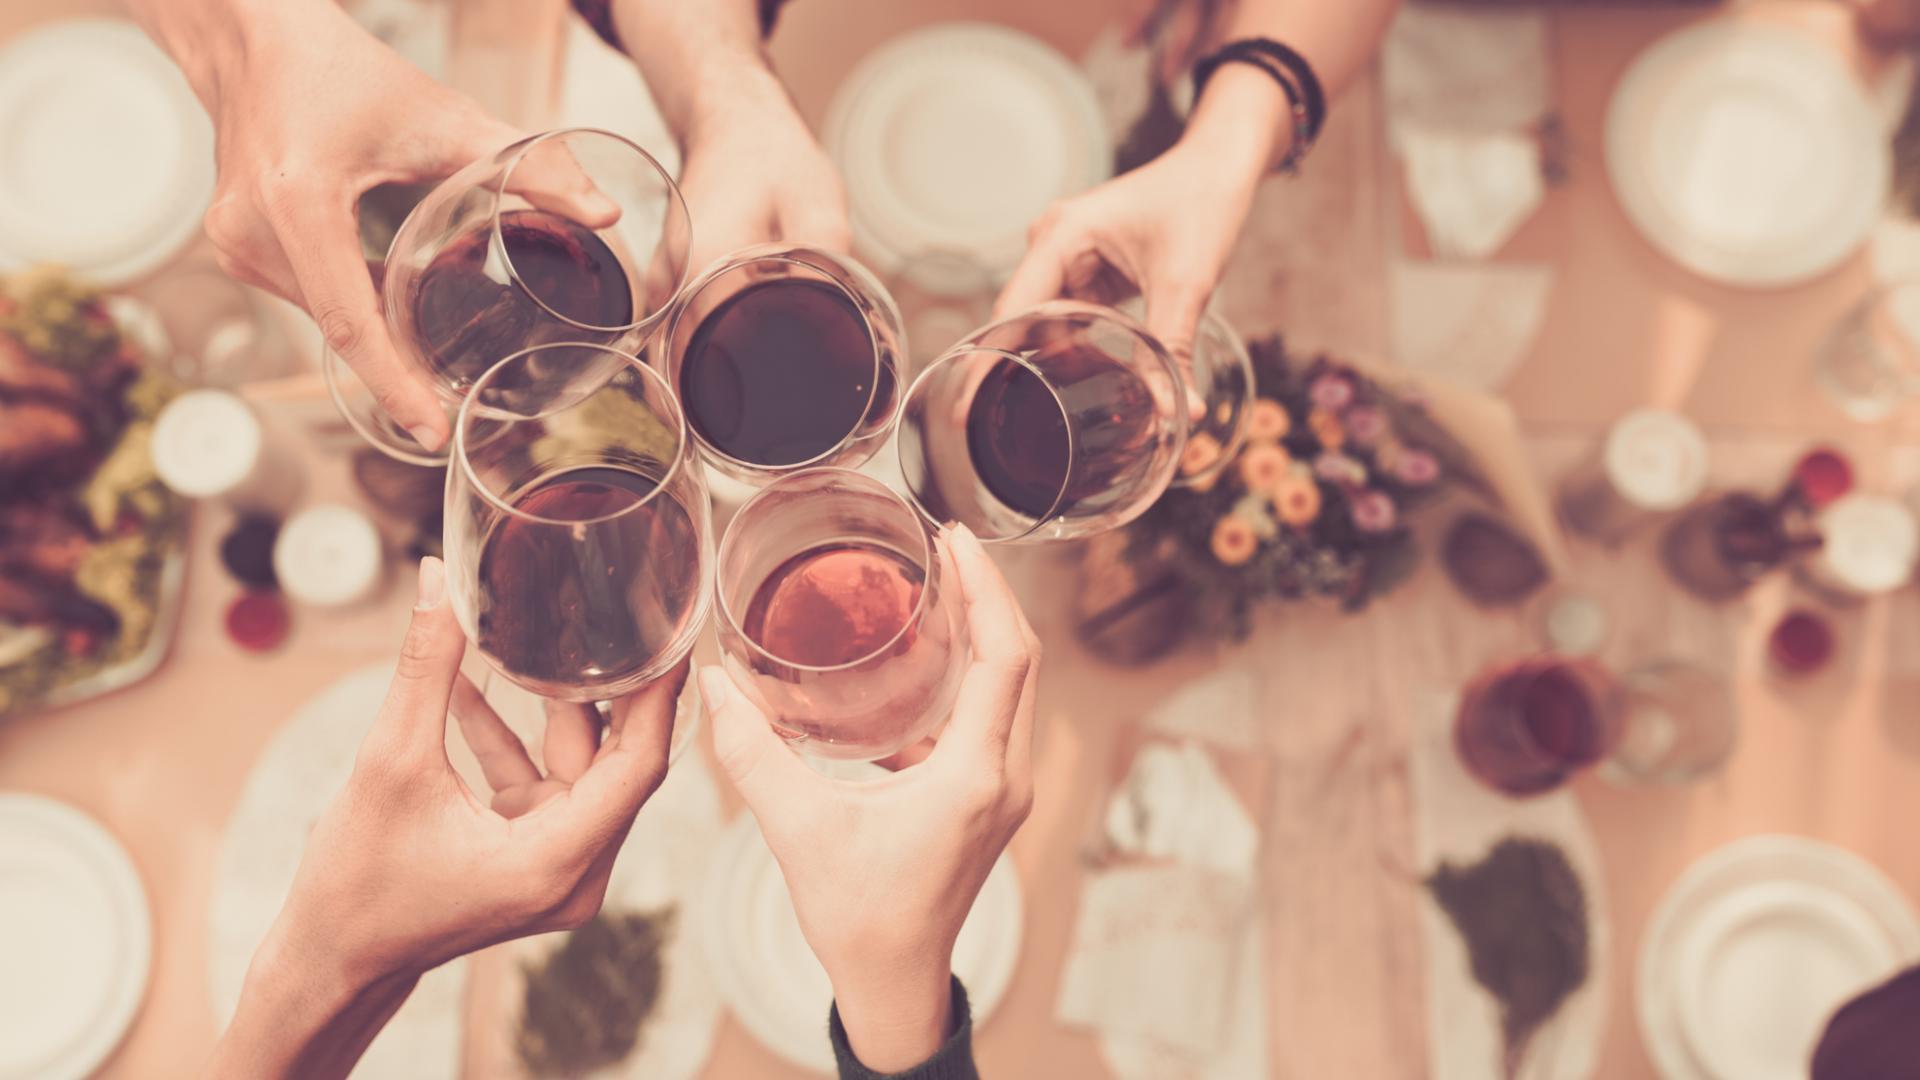 Wein Weingläser Gruppe